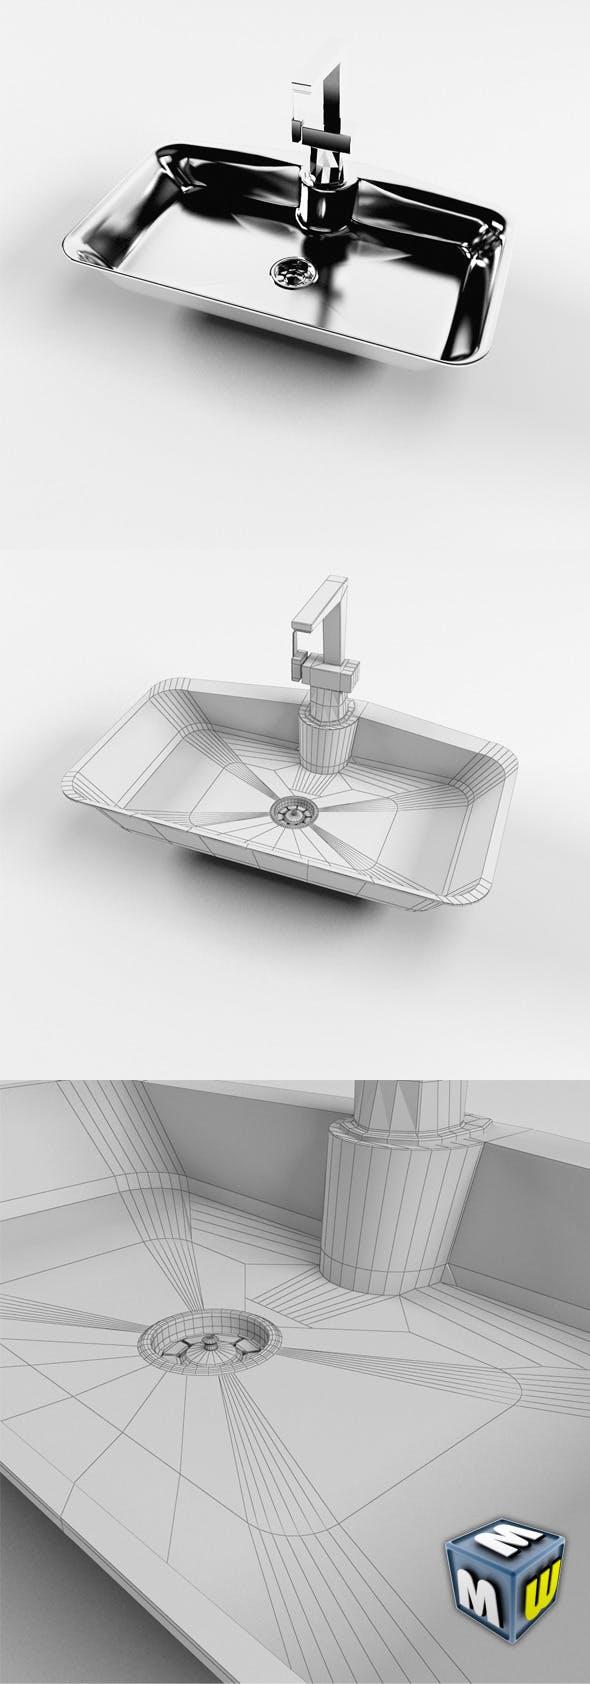 Sink MAX 2011 - 3DOcean Item for Sale